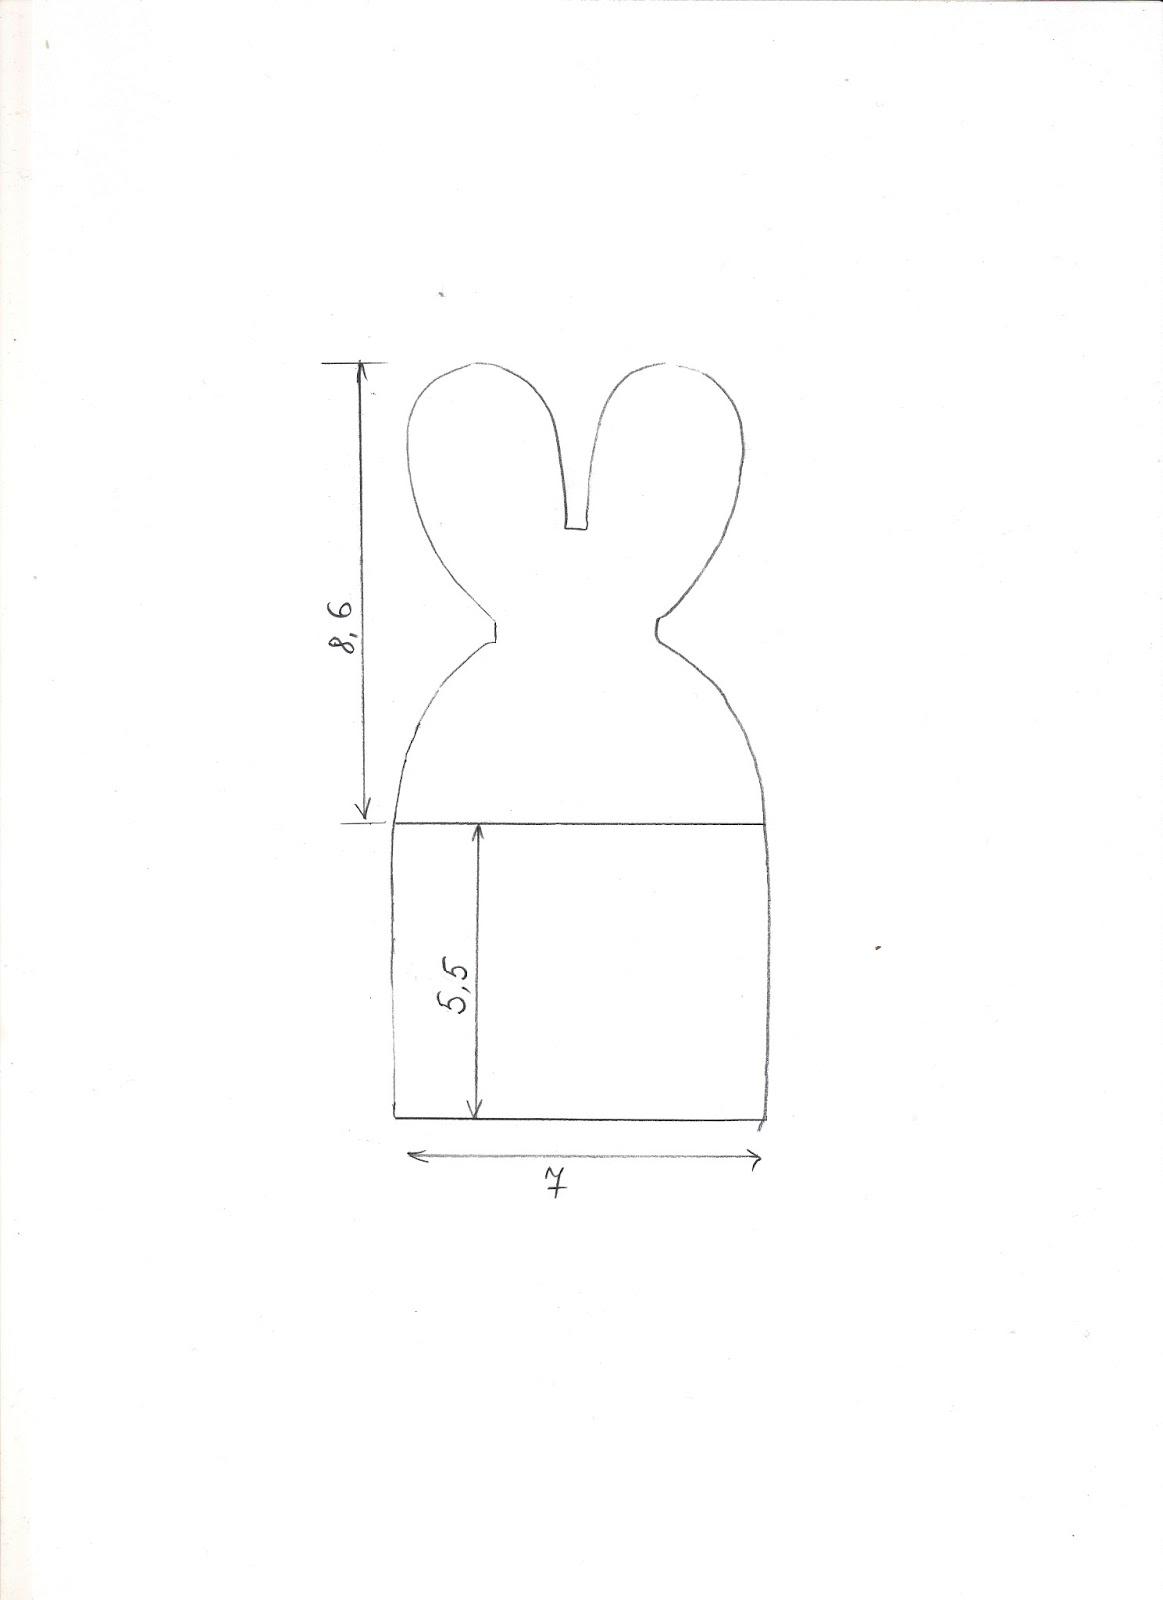 http://3.bp.blogspot.com/-iC7ISwW-WIU/UTSbFcavzRI/AAAAAAAAFgY/VyVtkpJBLDc/s1600/scan+rabbit0001.jpg